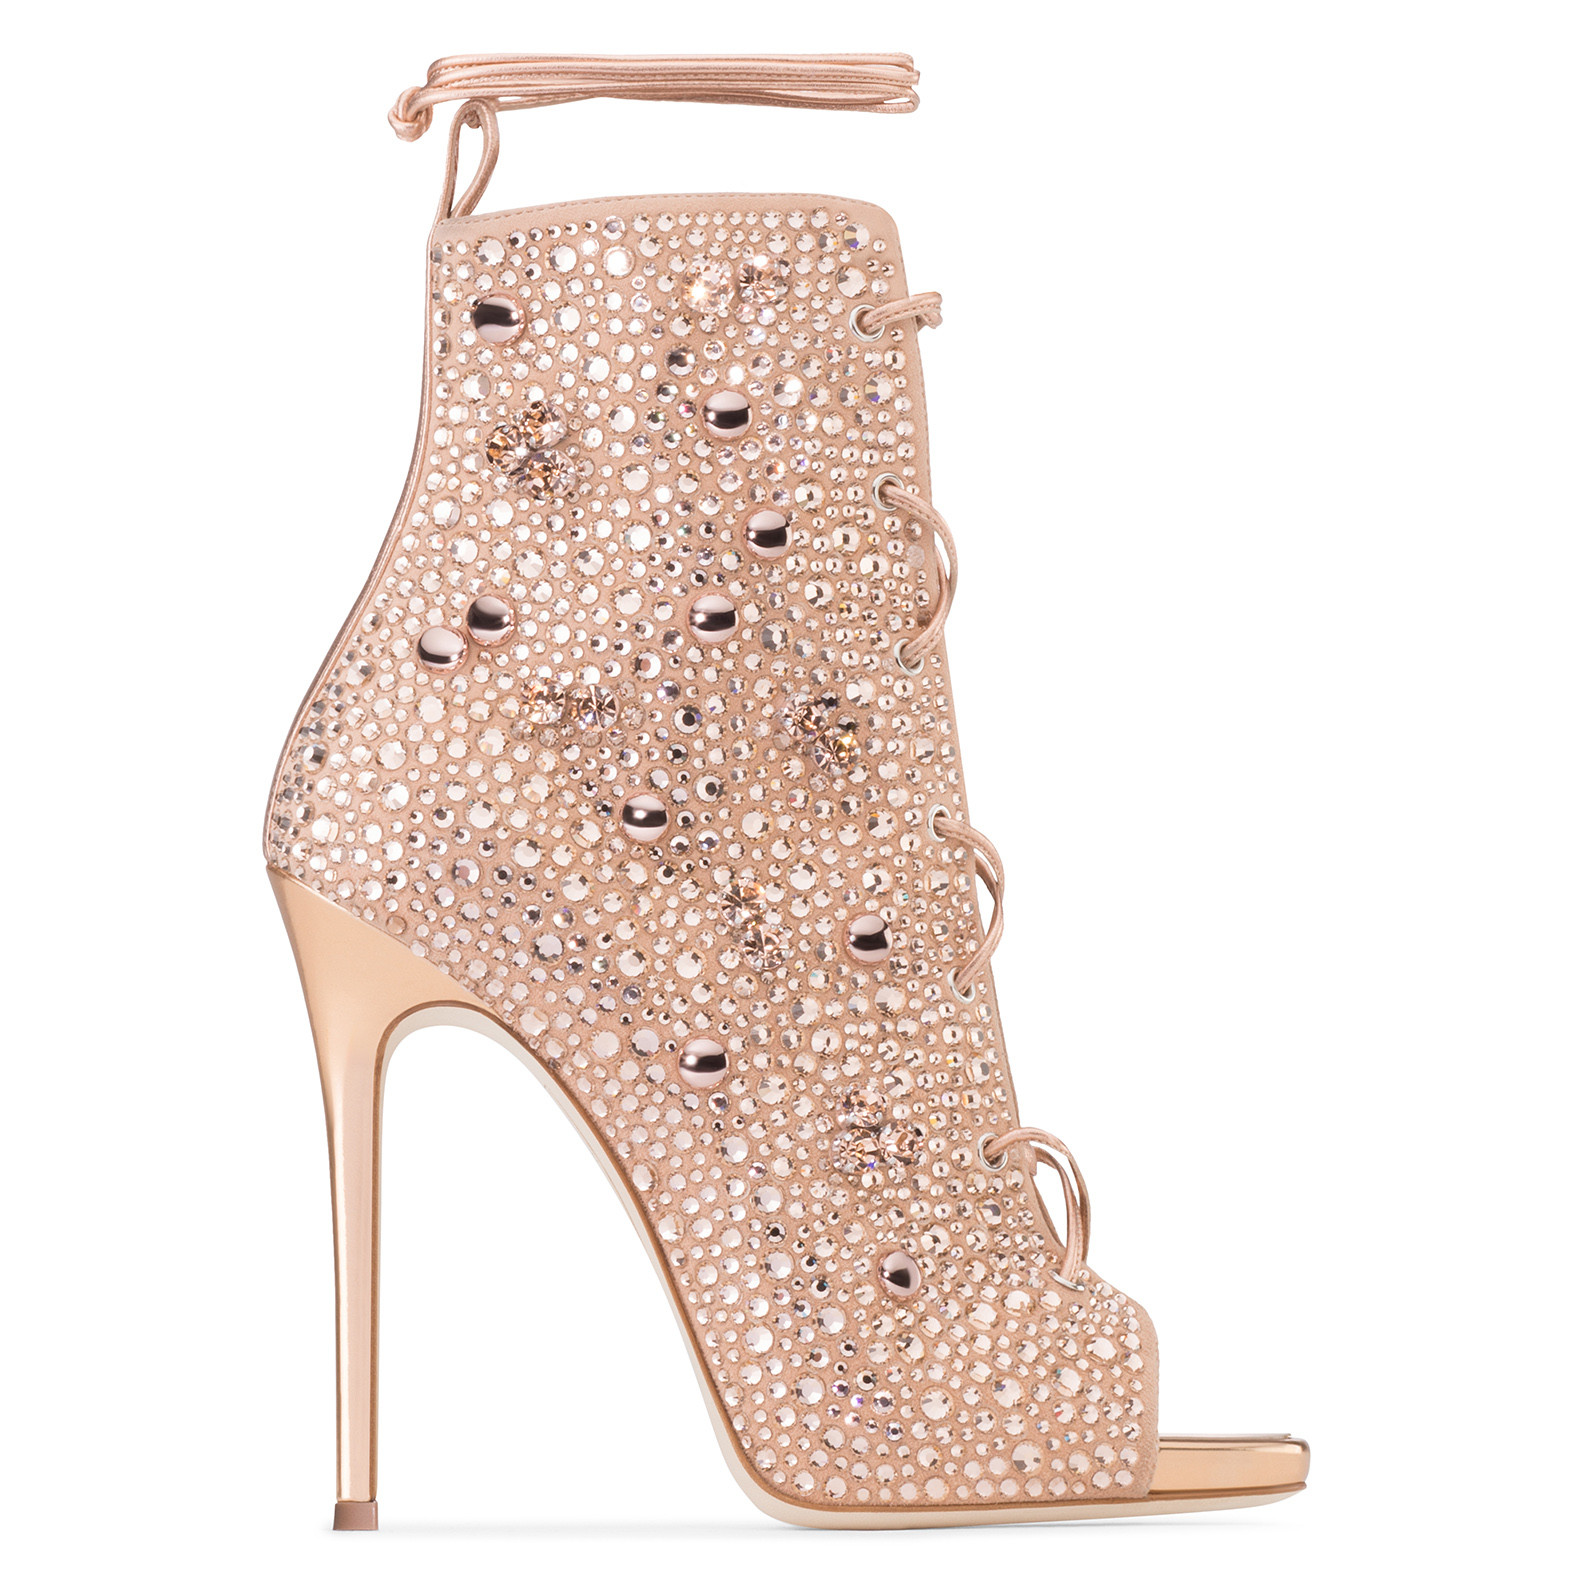 40ef2dc39cb GIUSEPPE ZANOTTI. Giuseppe For Jennifer Lopez 110 Crystal-Embellished Suede  ...